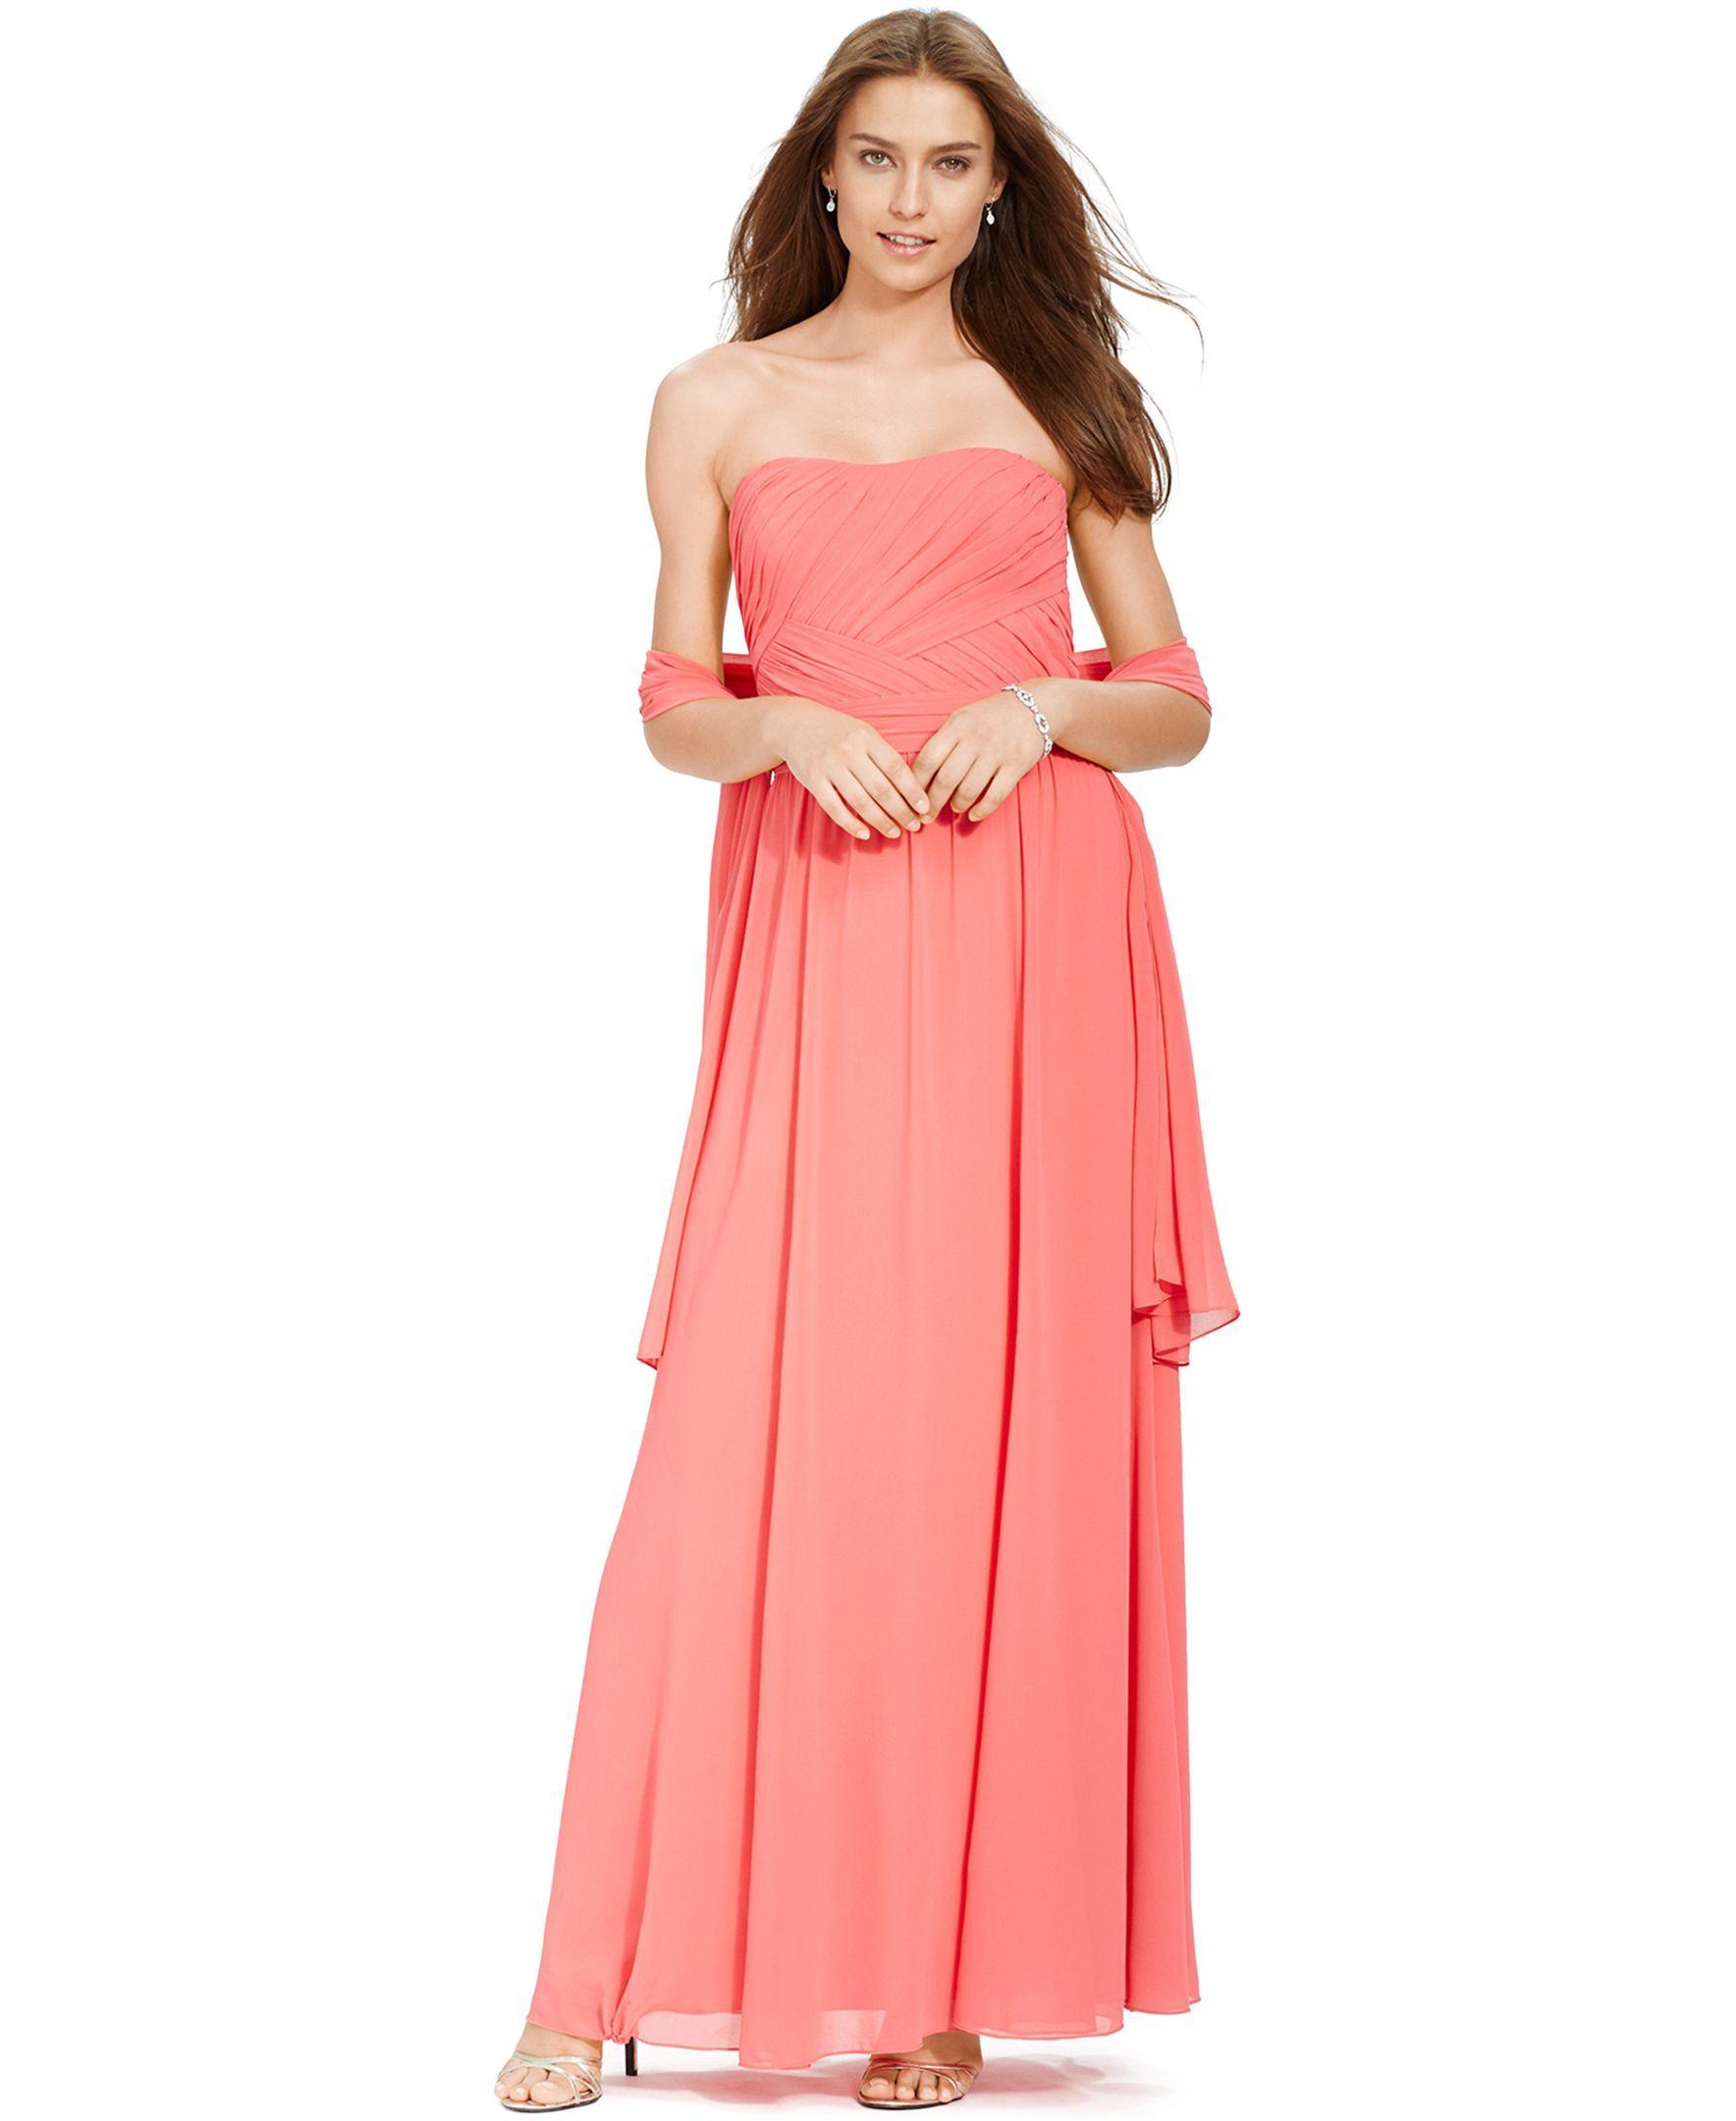 Lauren ralph lauren strapless ruched gown products pinterest